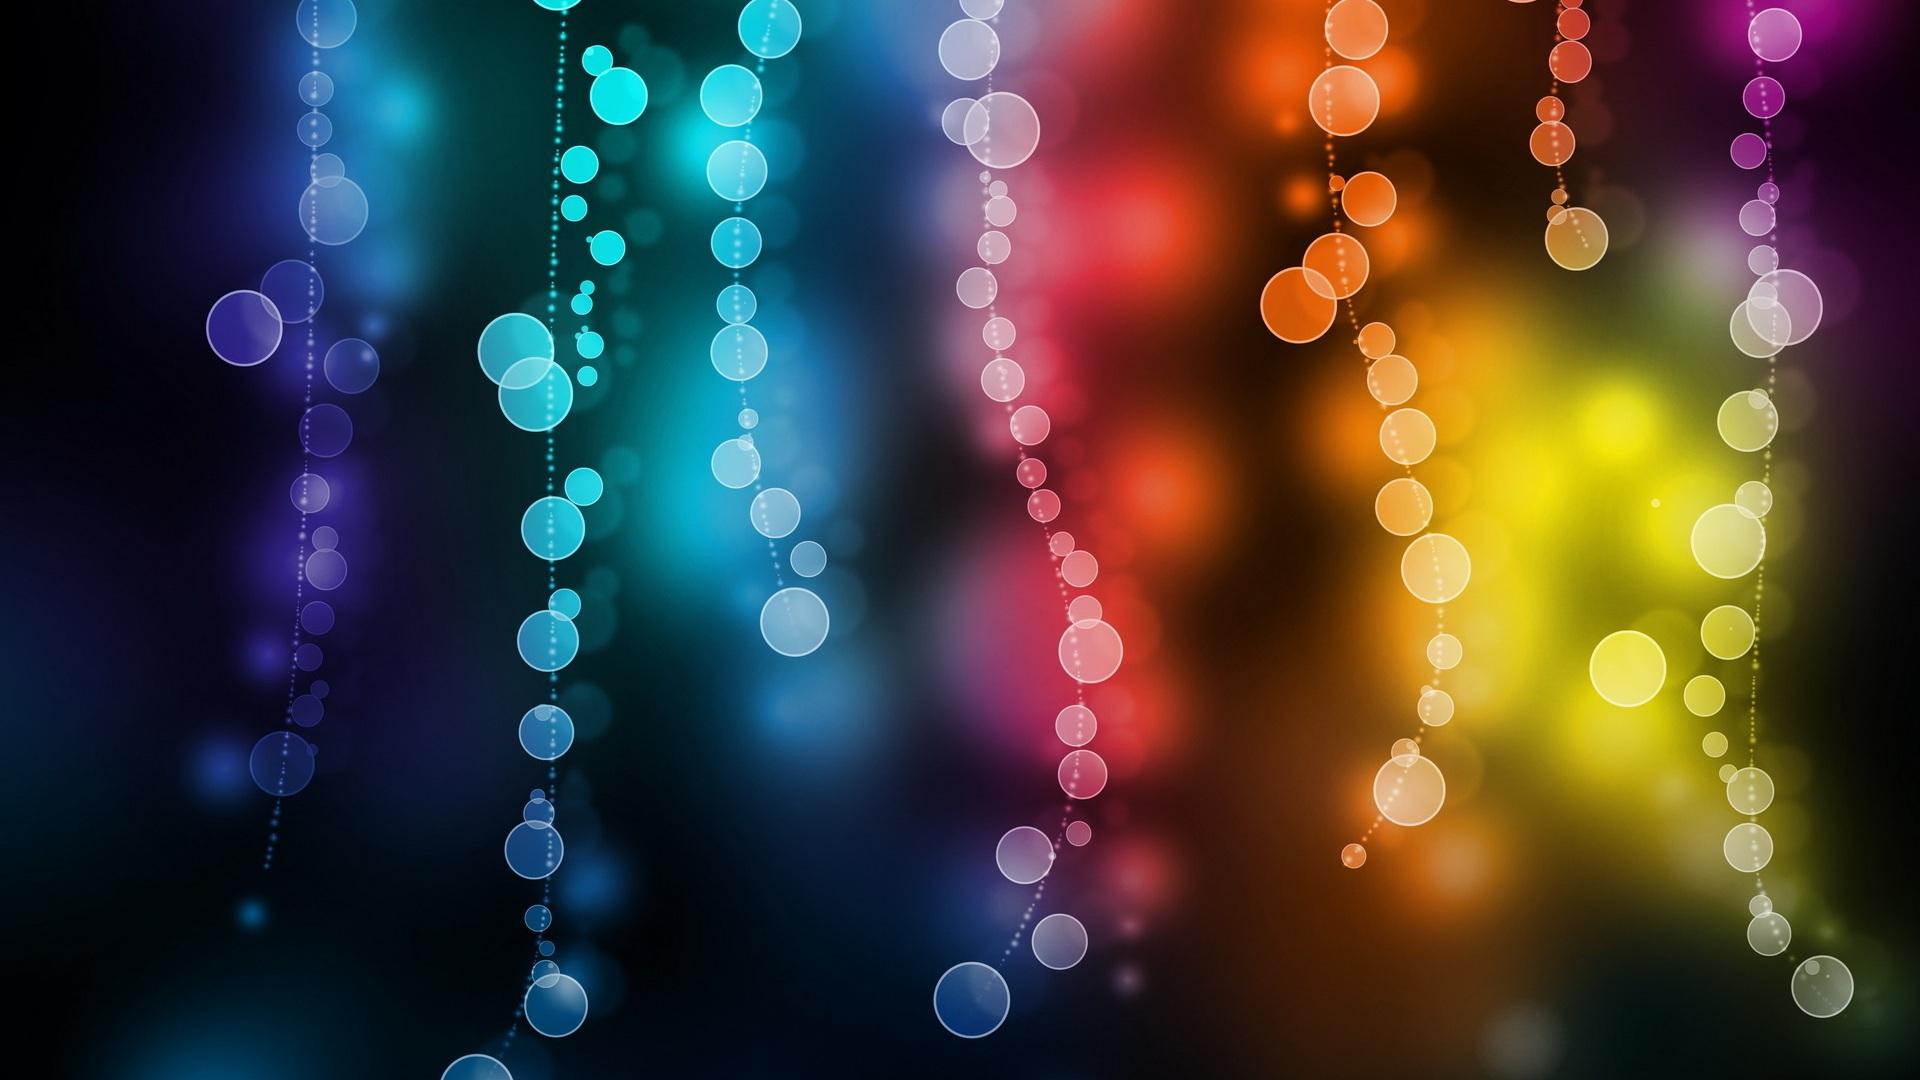 1920x1080 Abstracto Full Hd 1920x1080: Patrón De Círculo Colorido Abstracto Fondos De Pantalla